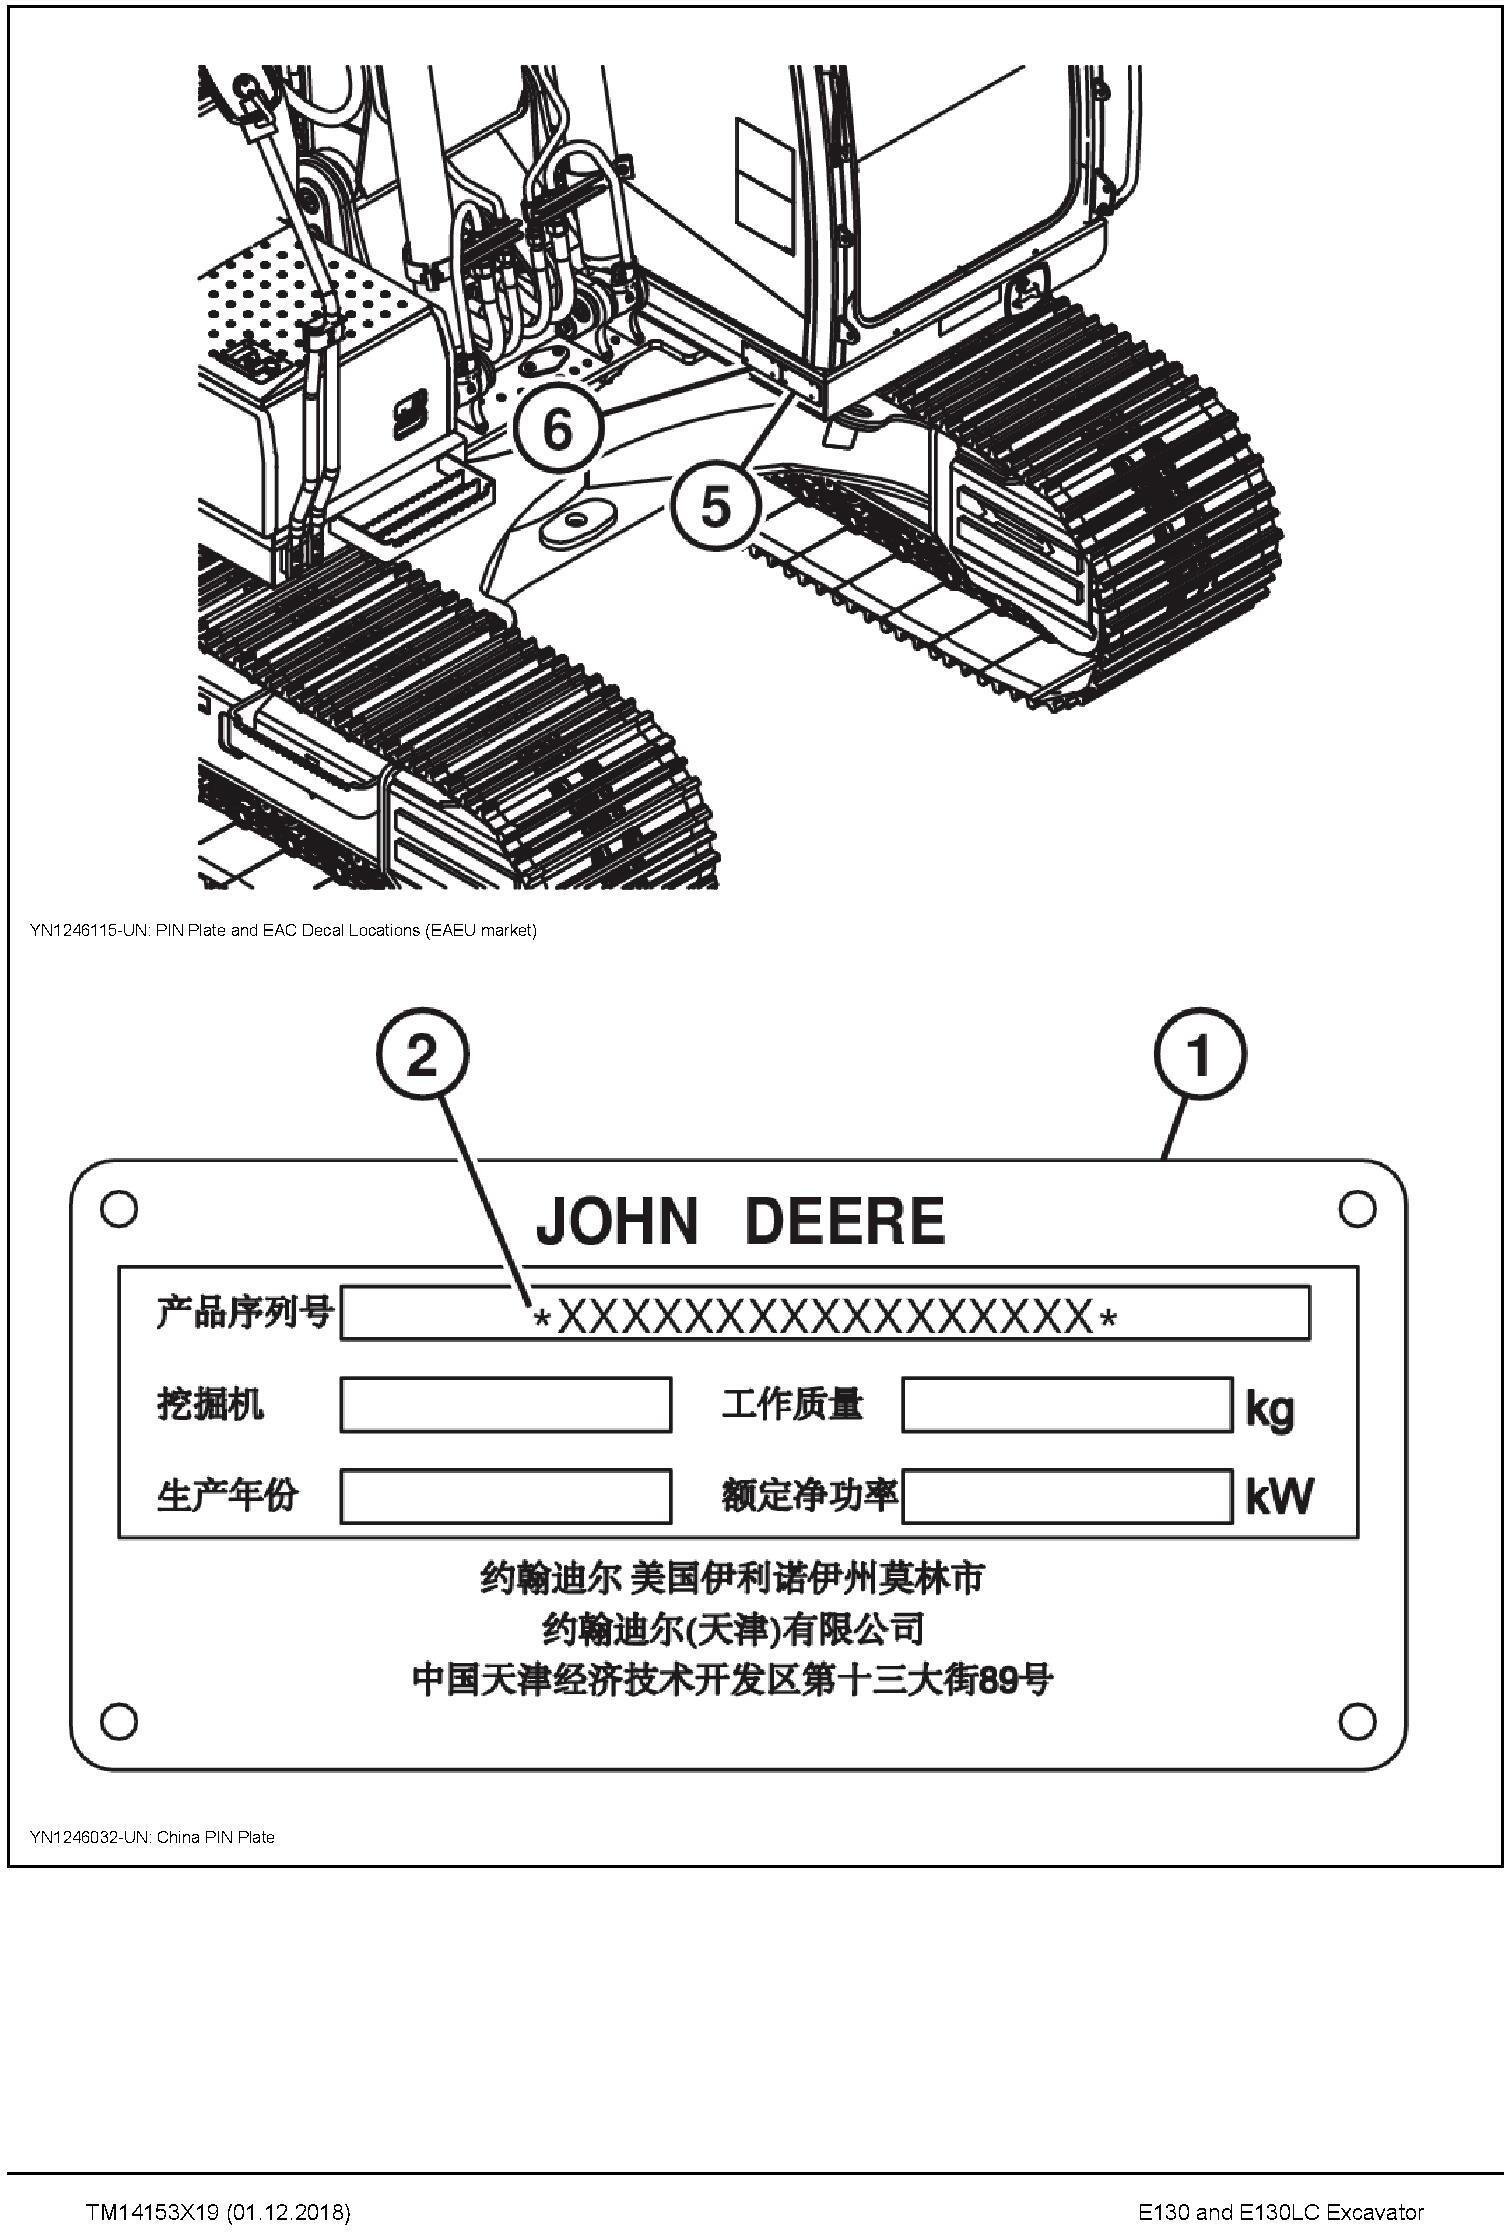 John Deere E130, E130LC (SN.from D300003) Excavator Repair Technical Manual (TM14153X19) - 1